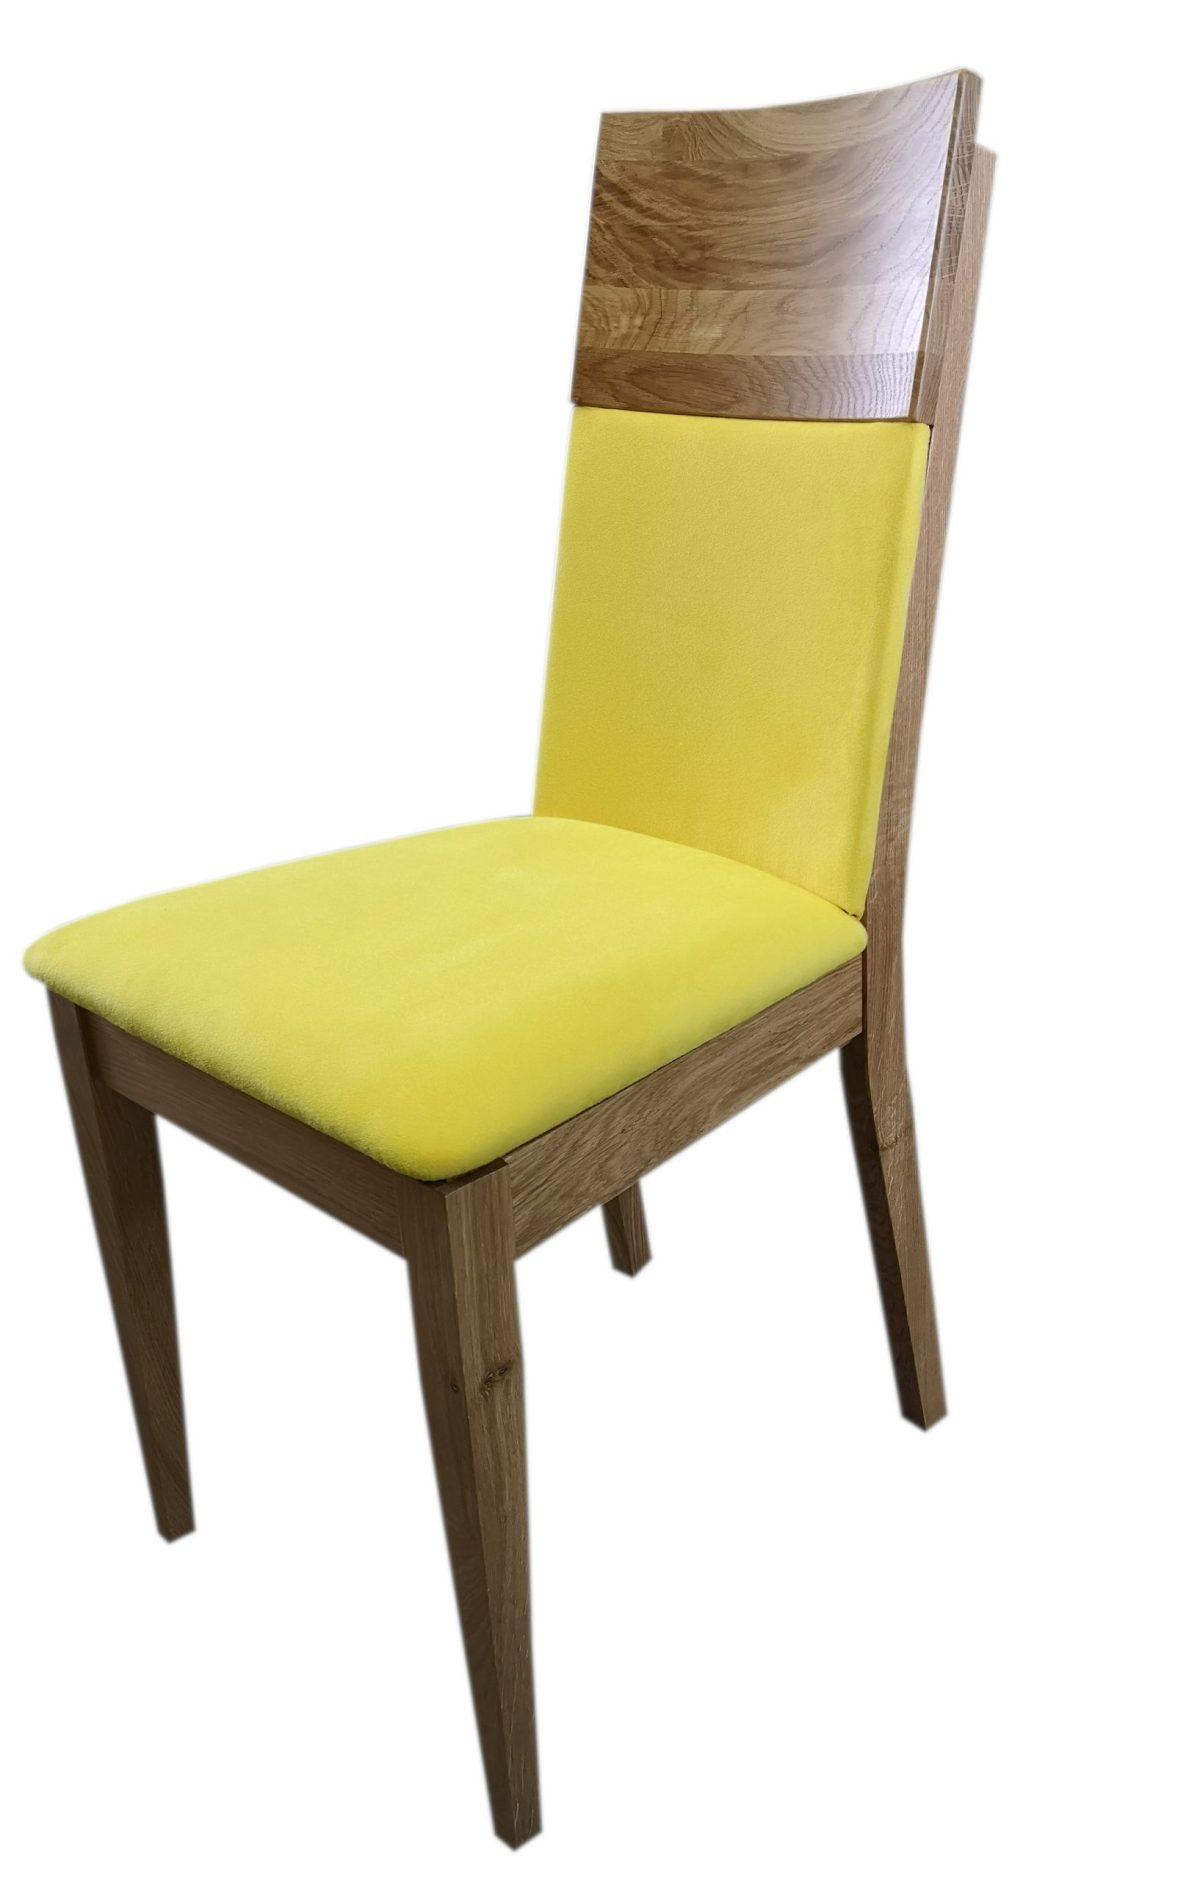 krzesło-dąb-kanarek